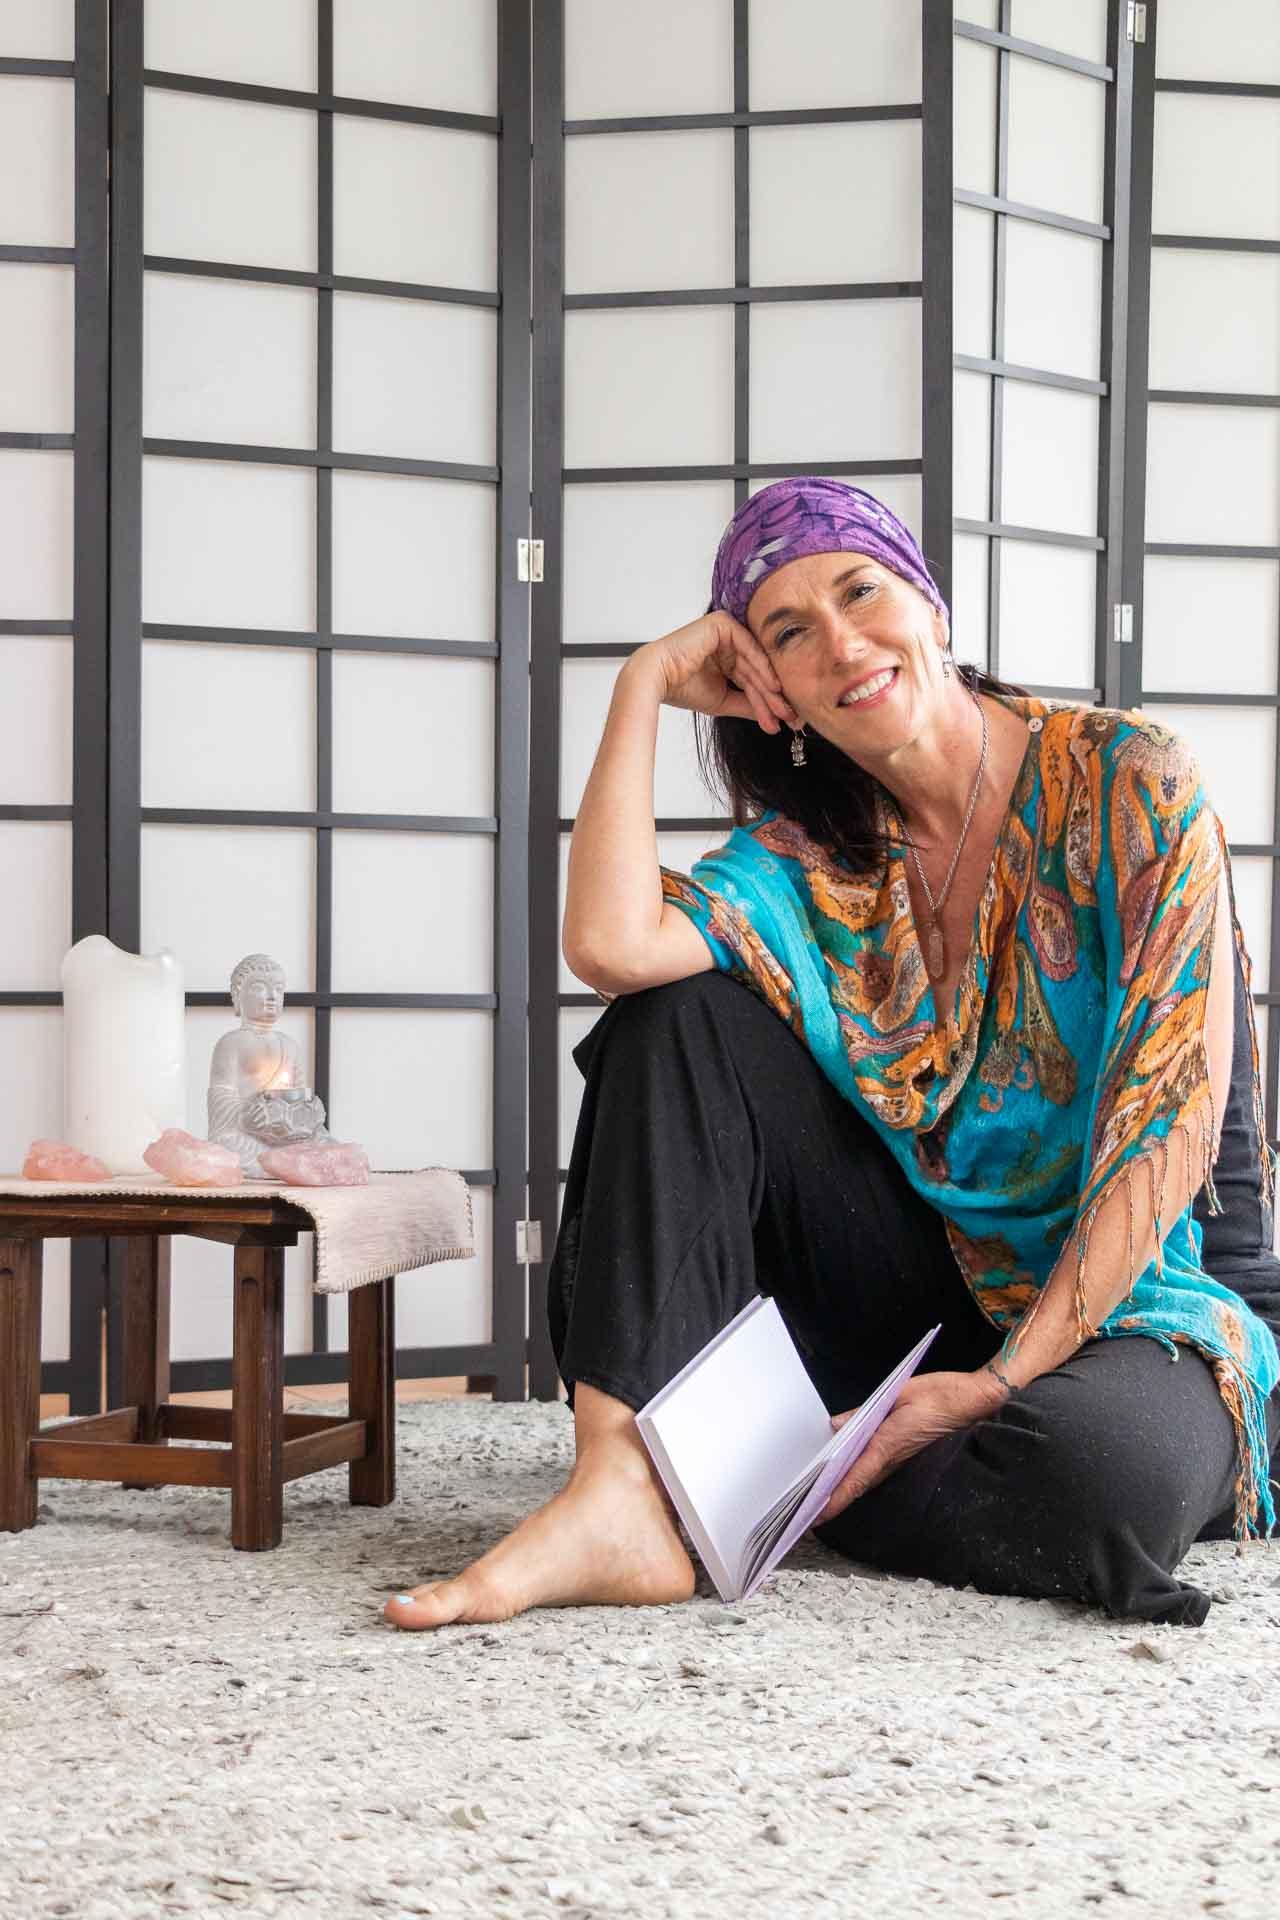 Celeste Du Toit - Transformational Life Coach And Holistic Therapist